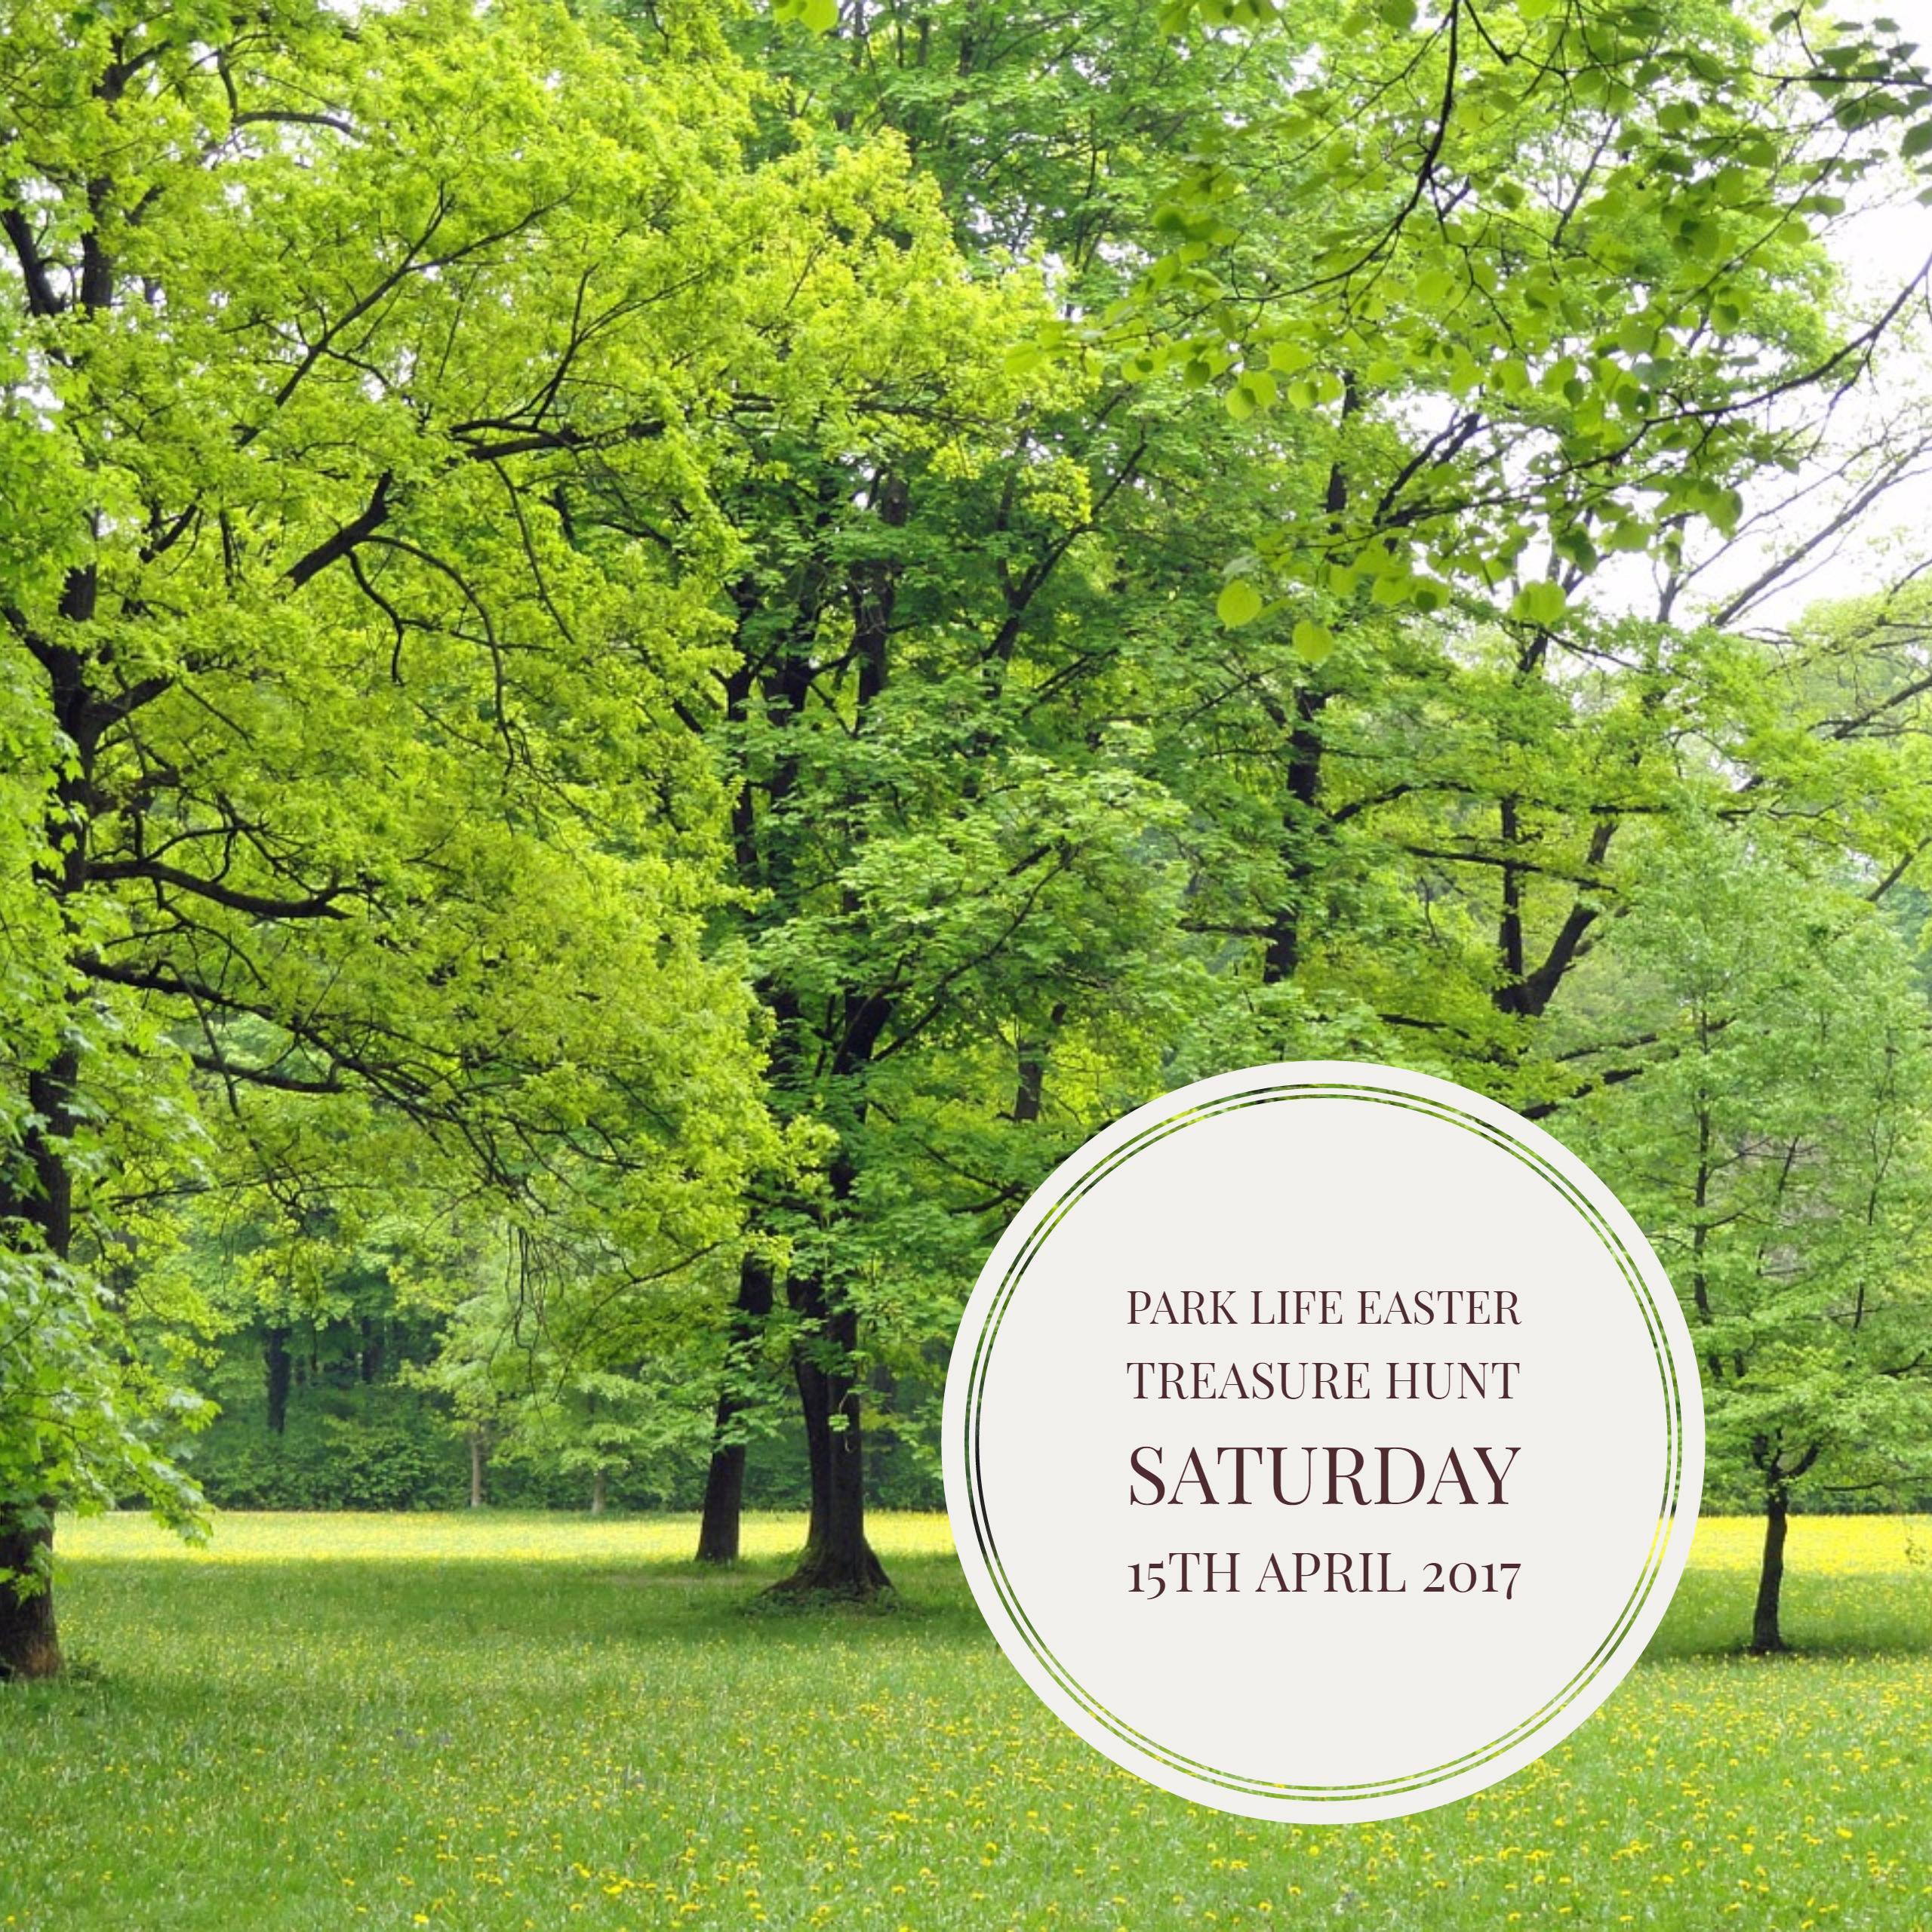 Park Life Easter Treasure Hunt by Treasure Hunts in London